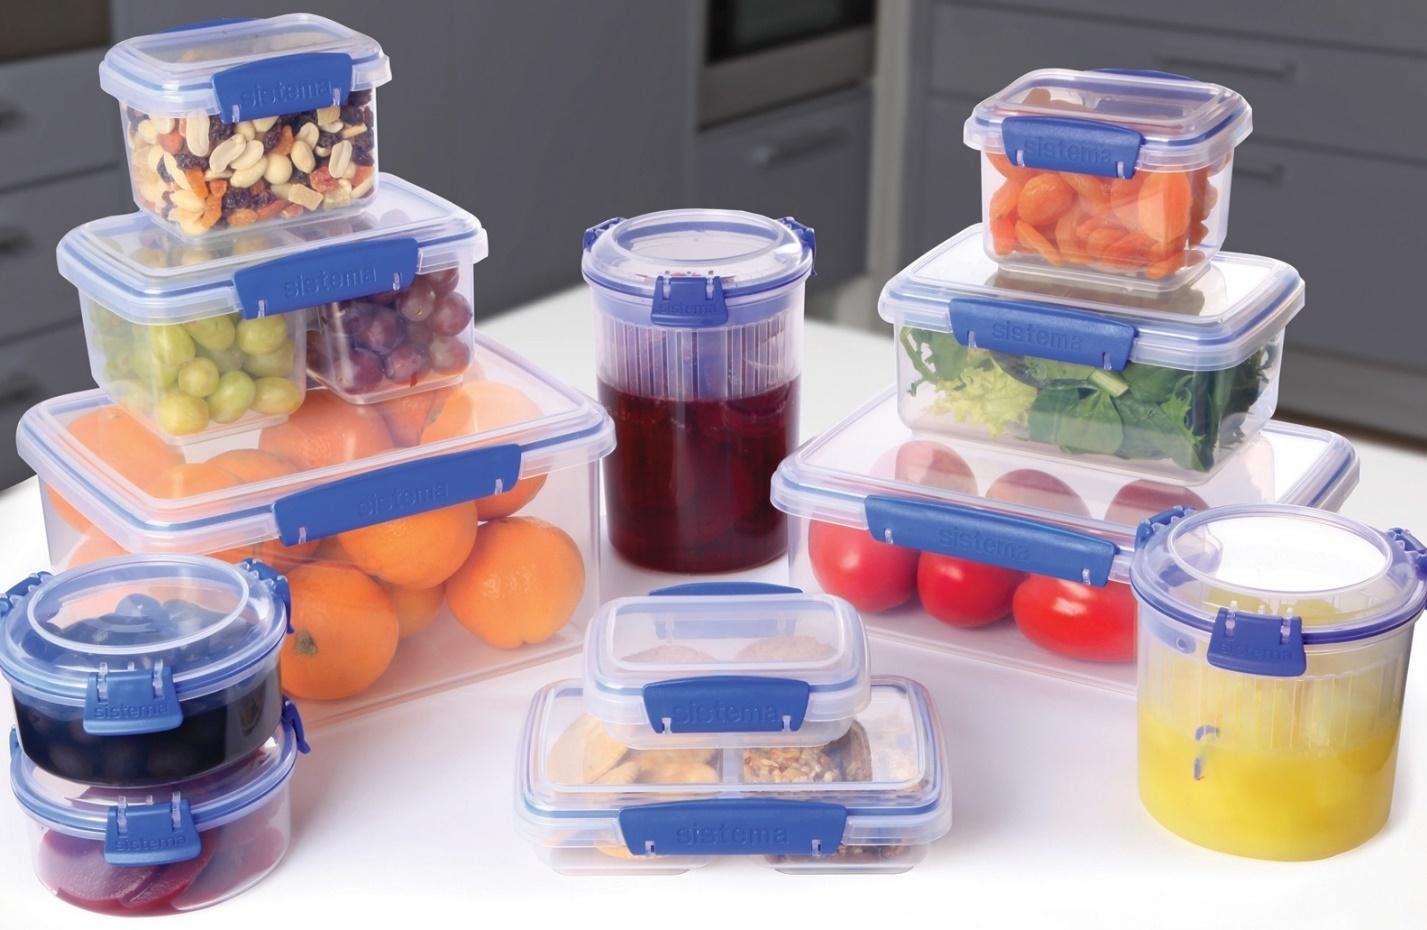 The Best Survival Food Emergency Food Storage Kits Travel Hymns